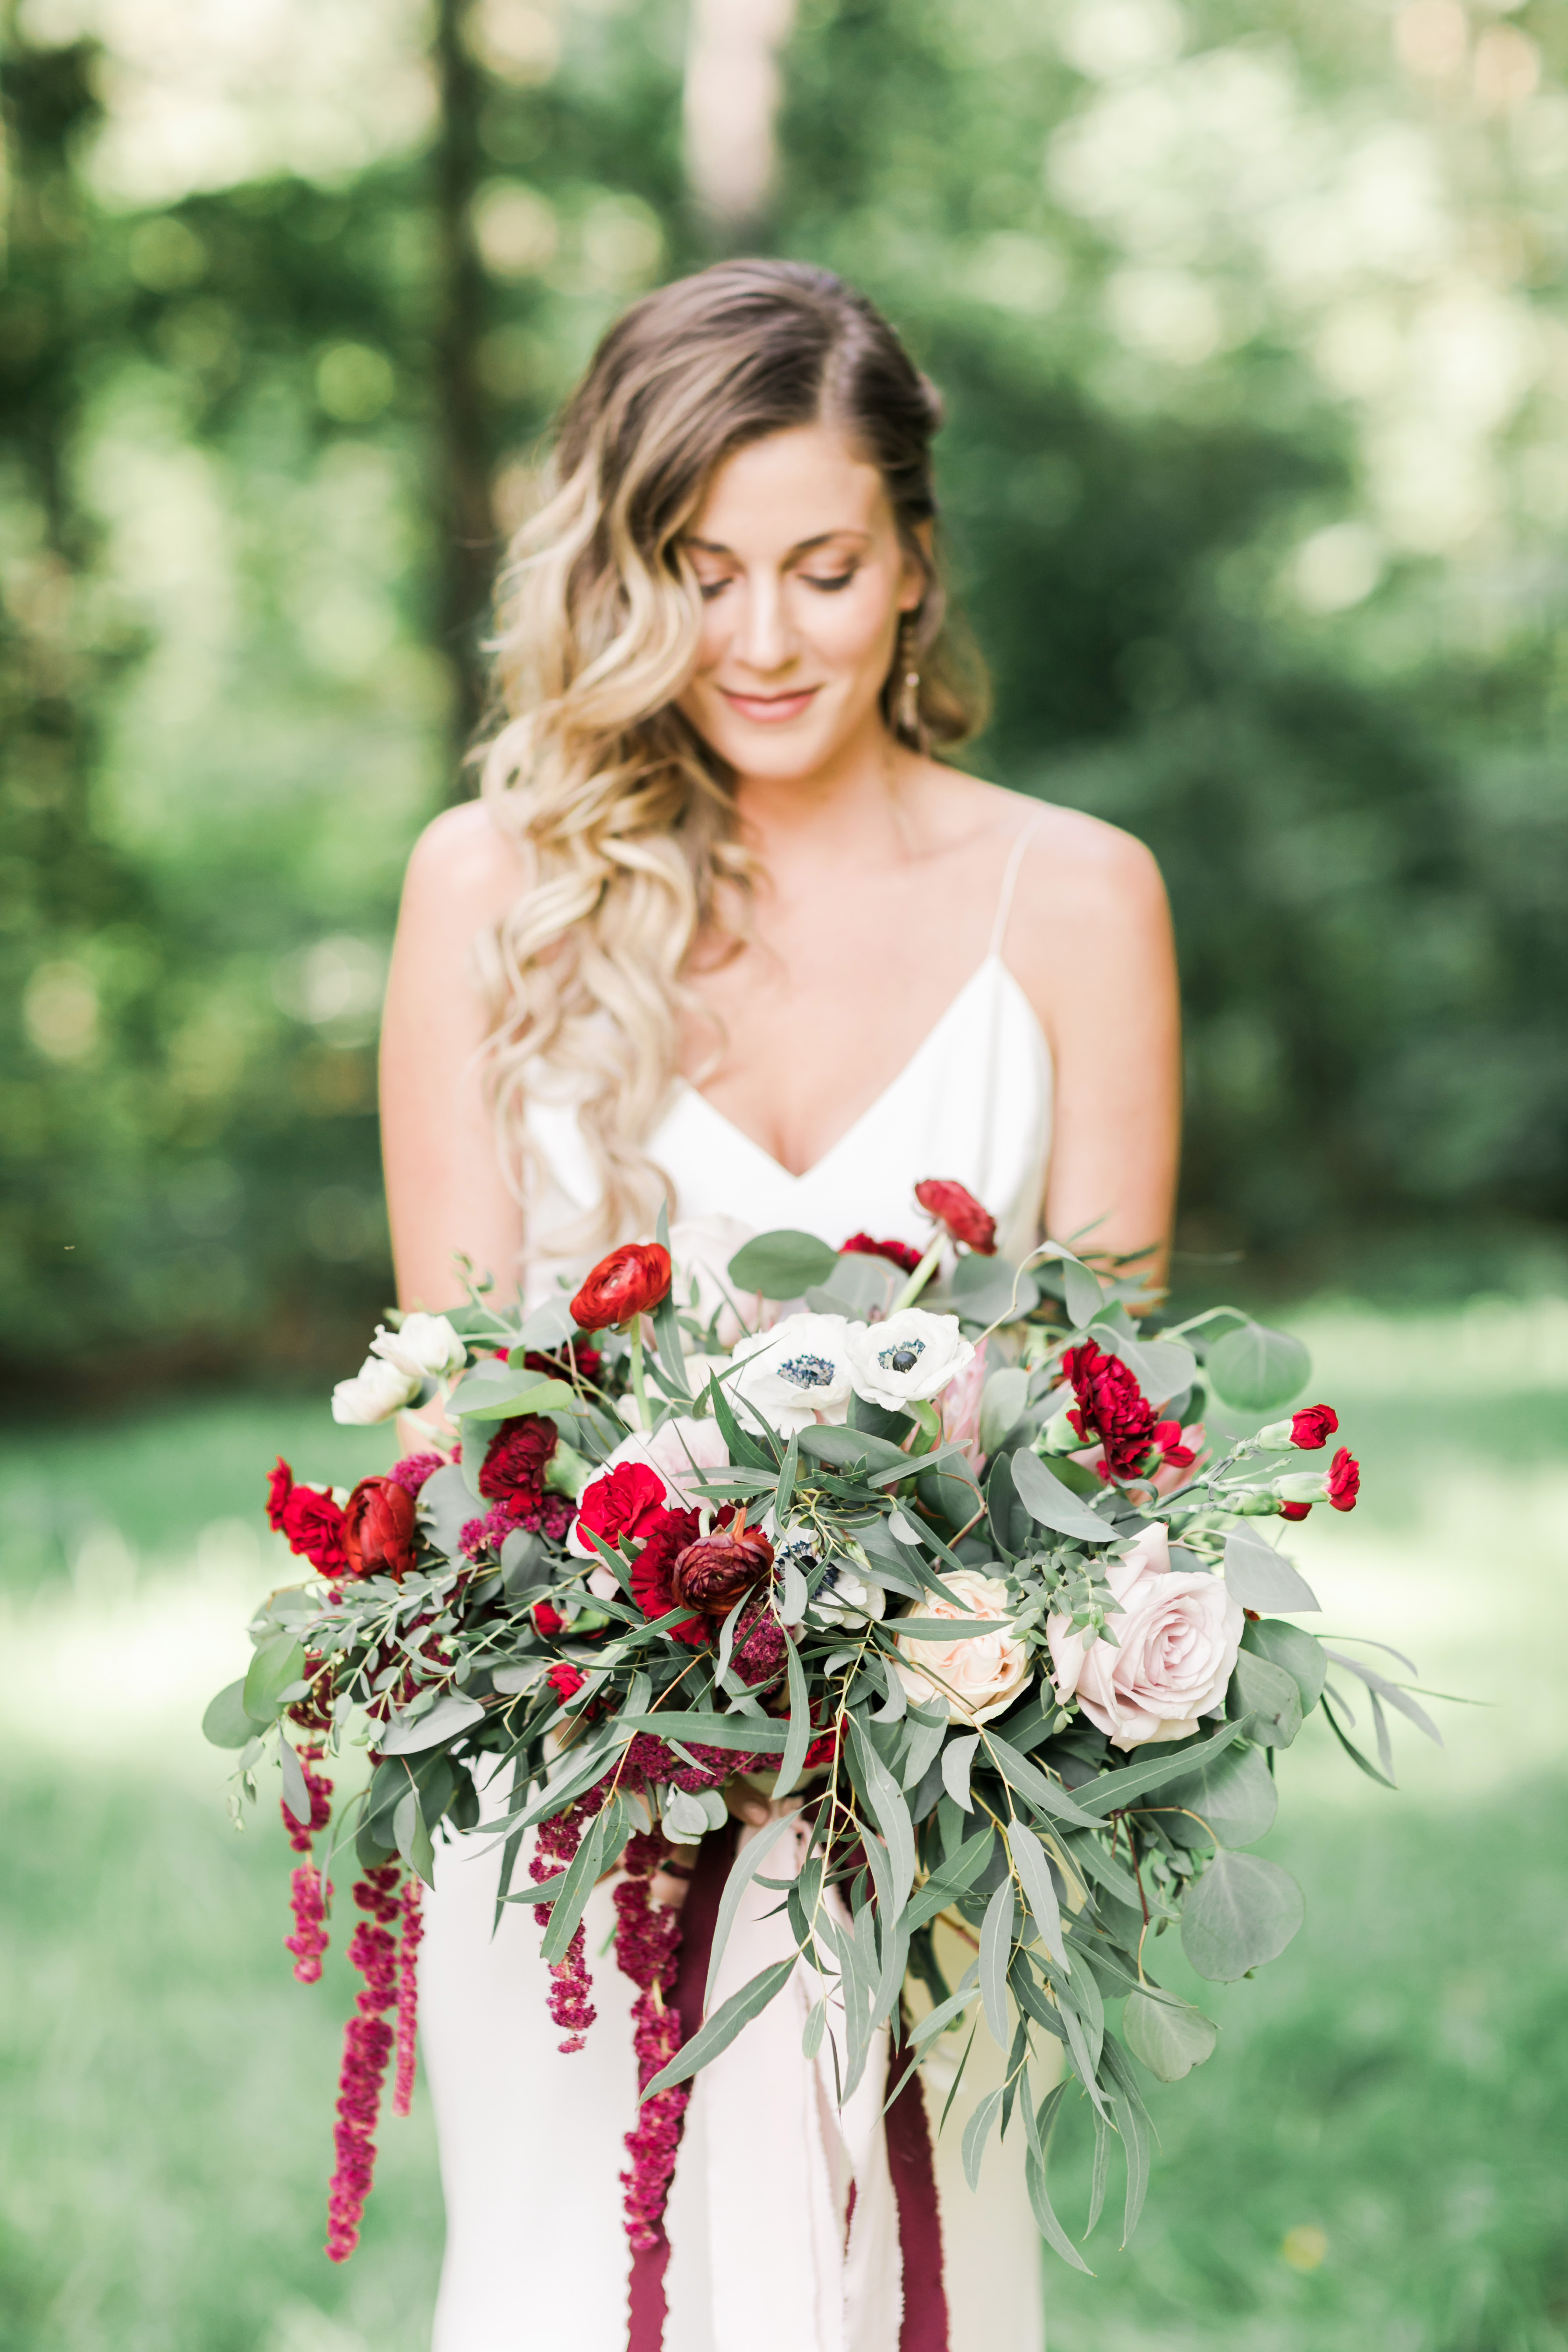 vanessa steven wedding bouquet